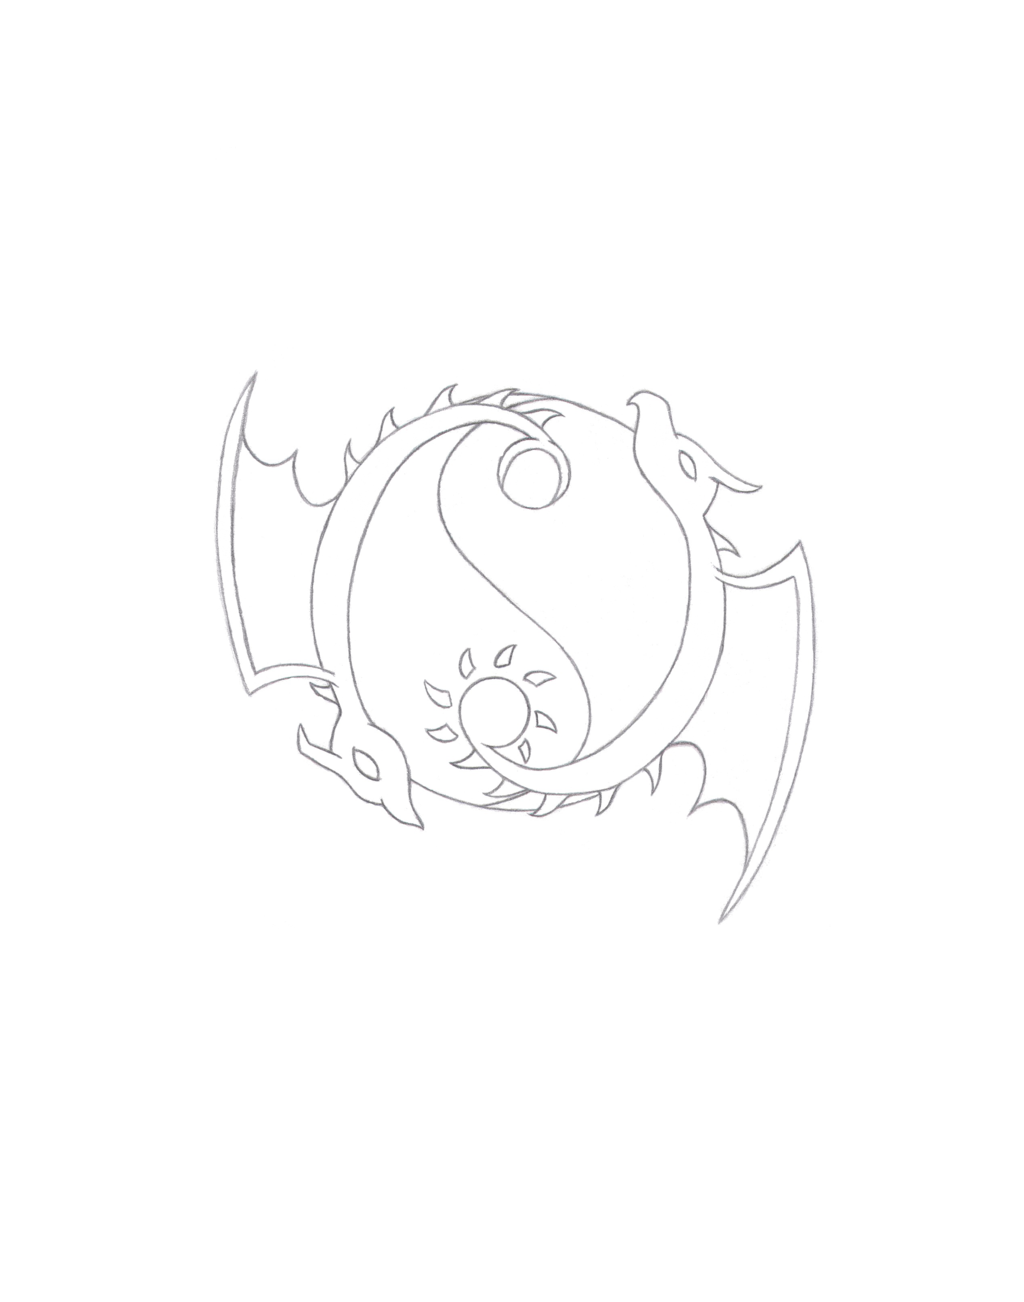 1024x1302 Yin Yang Dragon Tattoo Design Pencil Sketch By Pat In The Hat